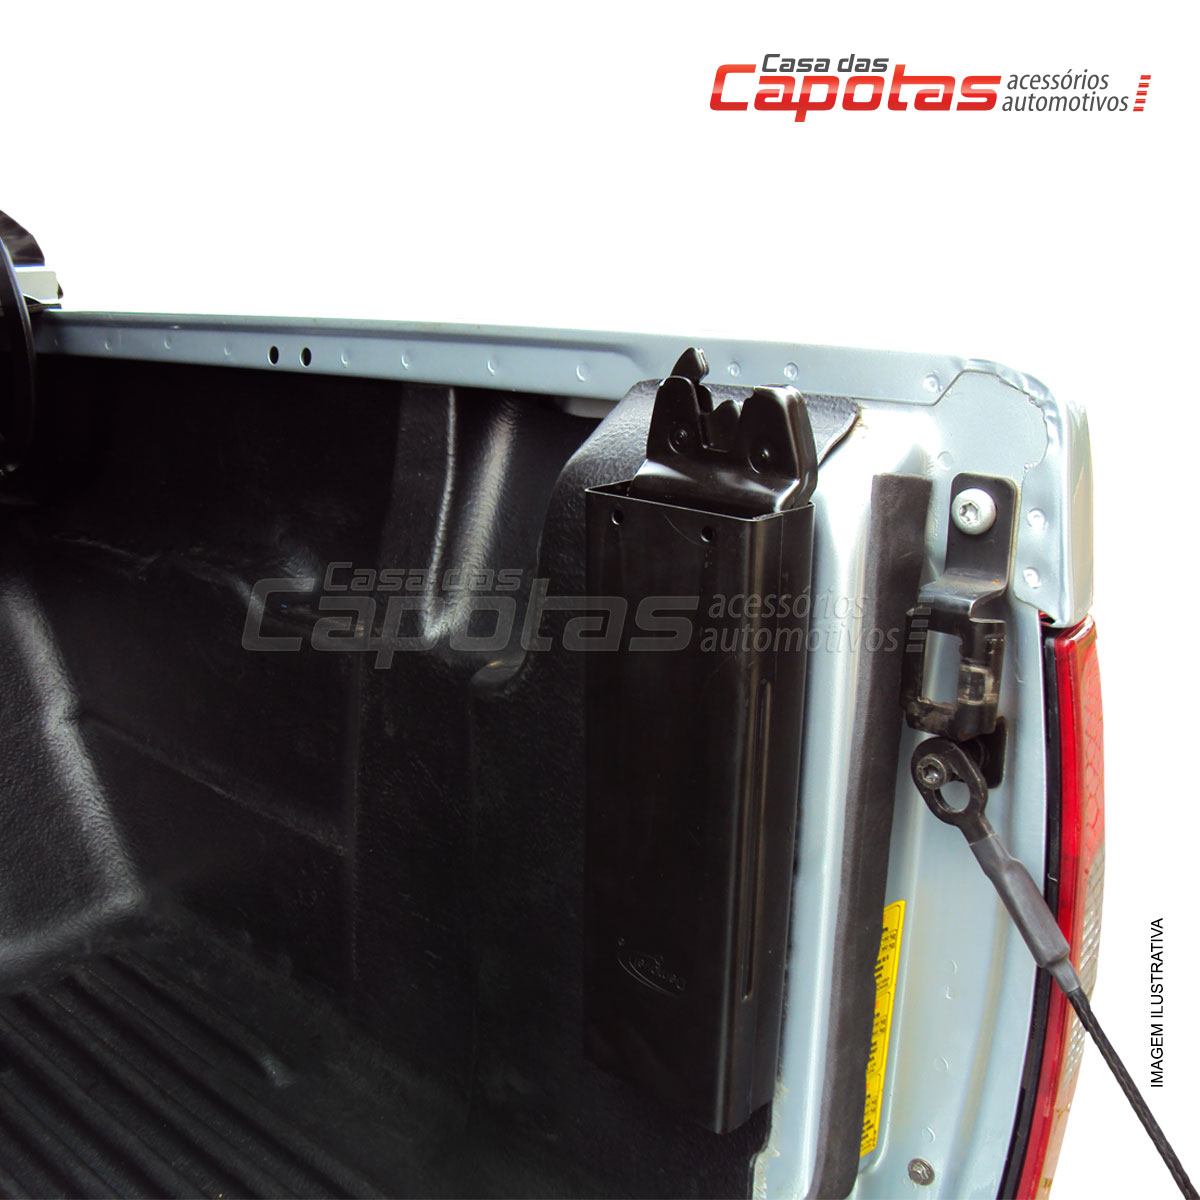 Tampão de aço capota elétrica L200 Triton XB, GL, GLS, GLX e Outdoor MT Diesel